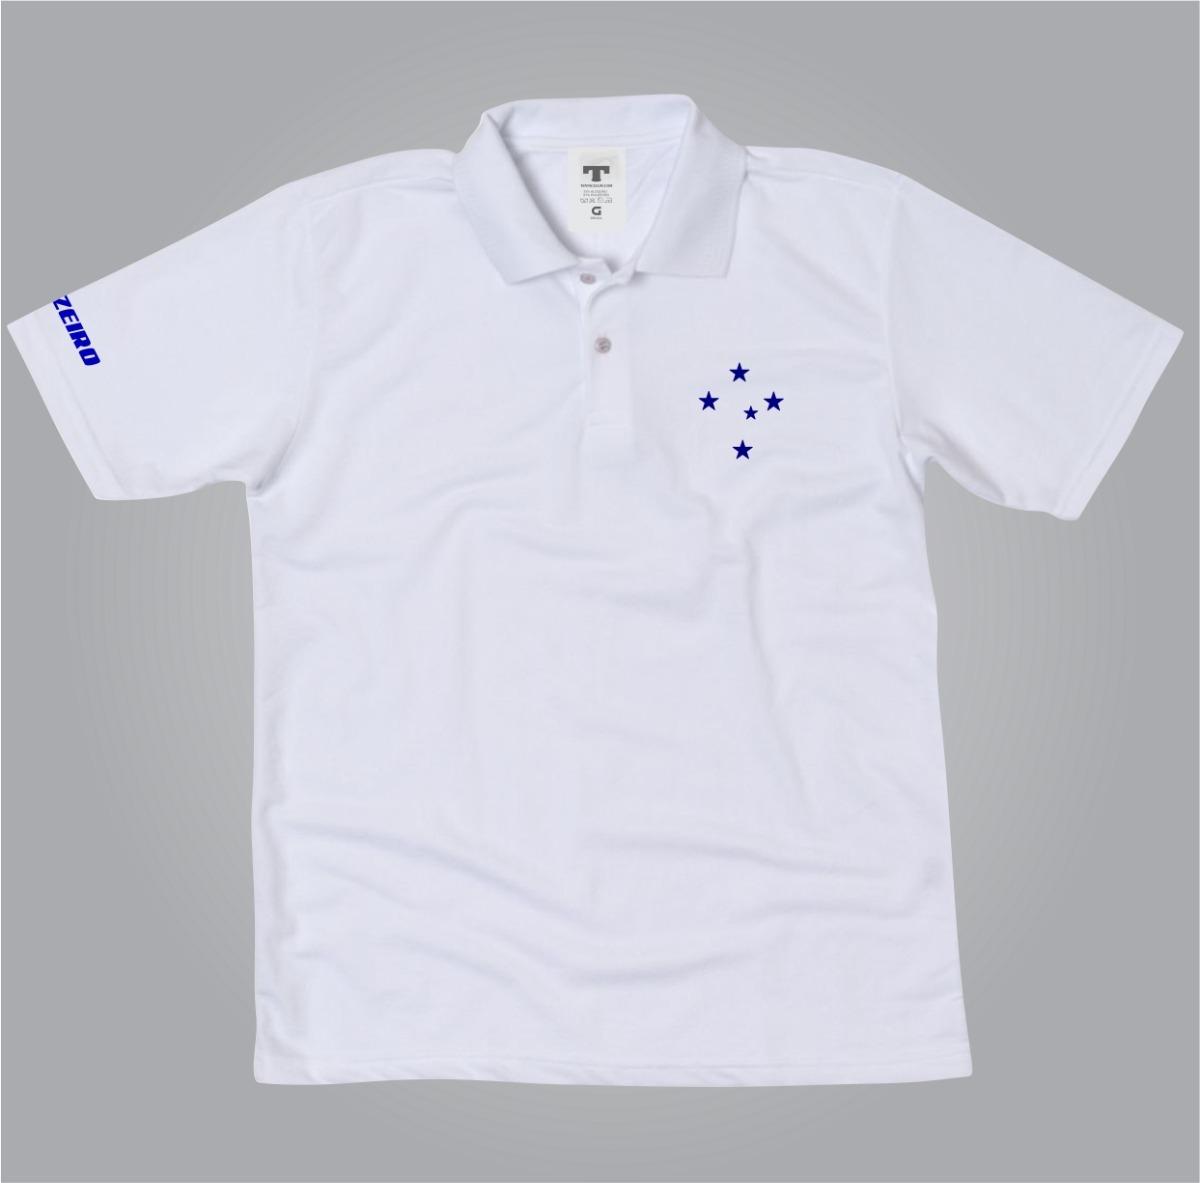 8b8199281b Camisa Polo Cruzeiro